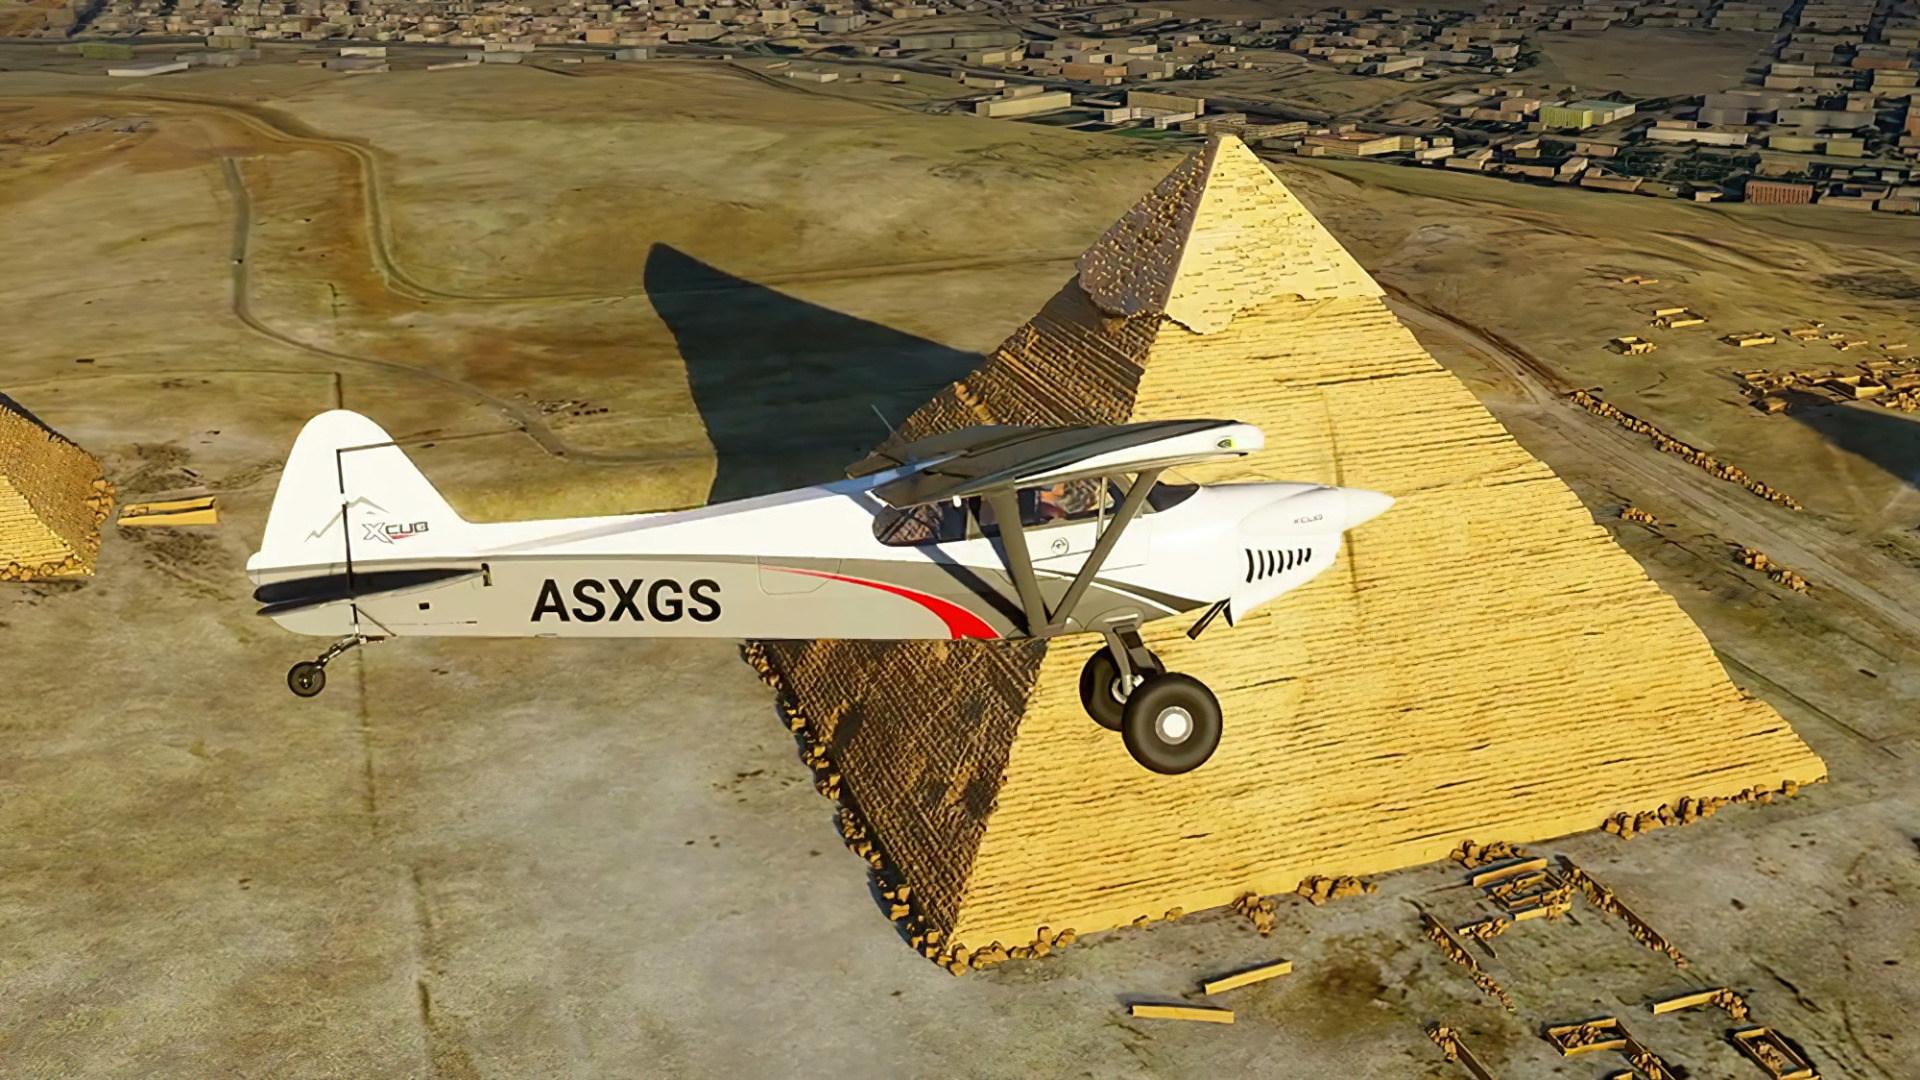 Microsoft, Trailer, Gaming, Spiele, Video, Games, flugsimulation, Flight Simulator 2020, Flugsimulator, Afrika, Flugzeuge, Around the World